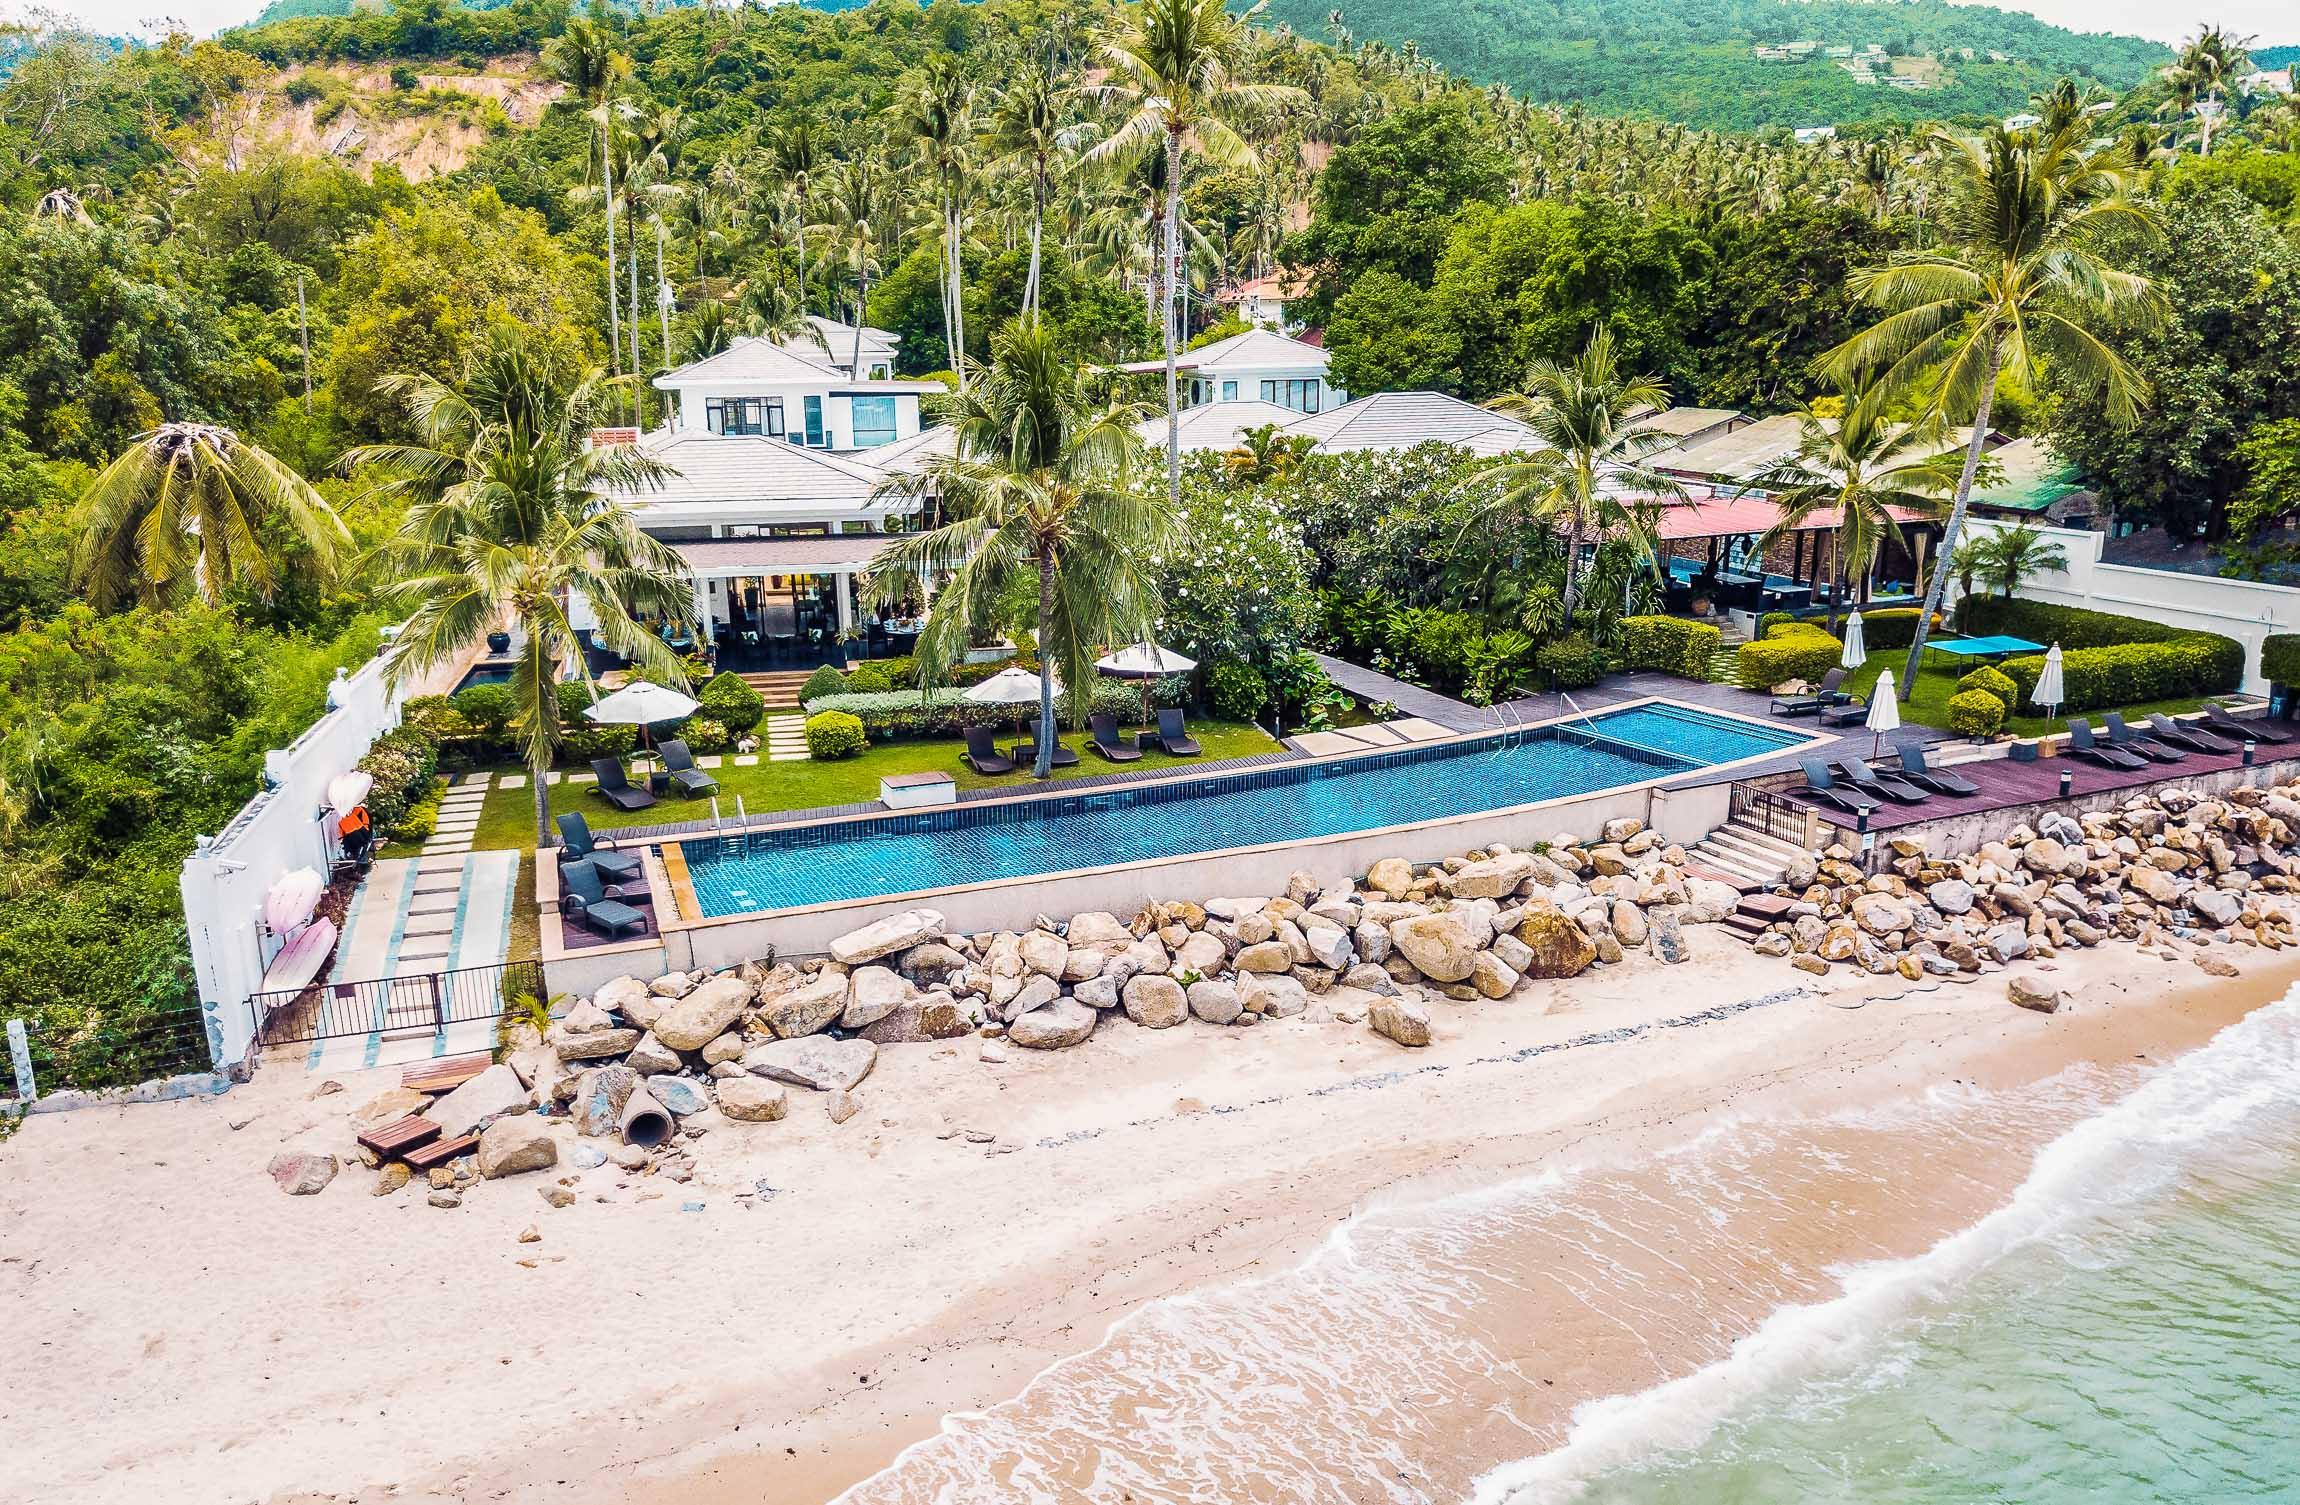 Lotus Beach Villa - Koh Samui, Thailand